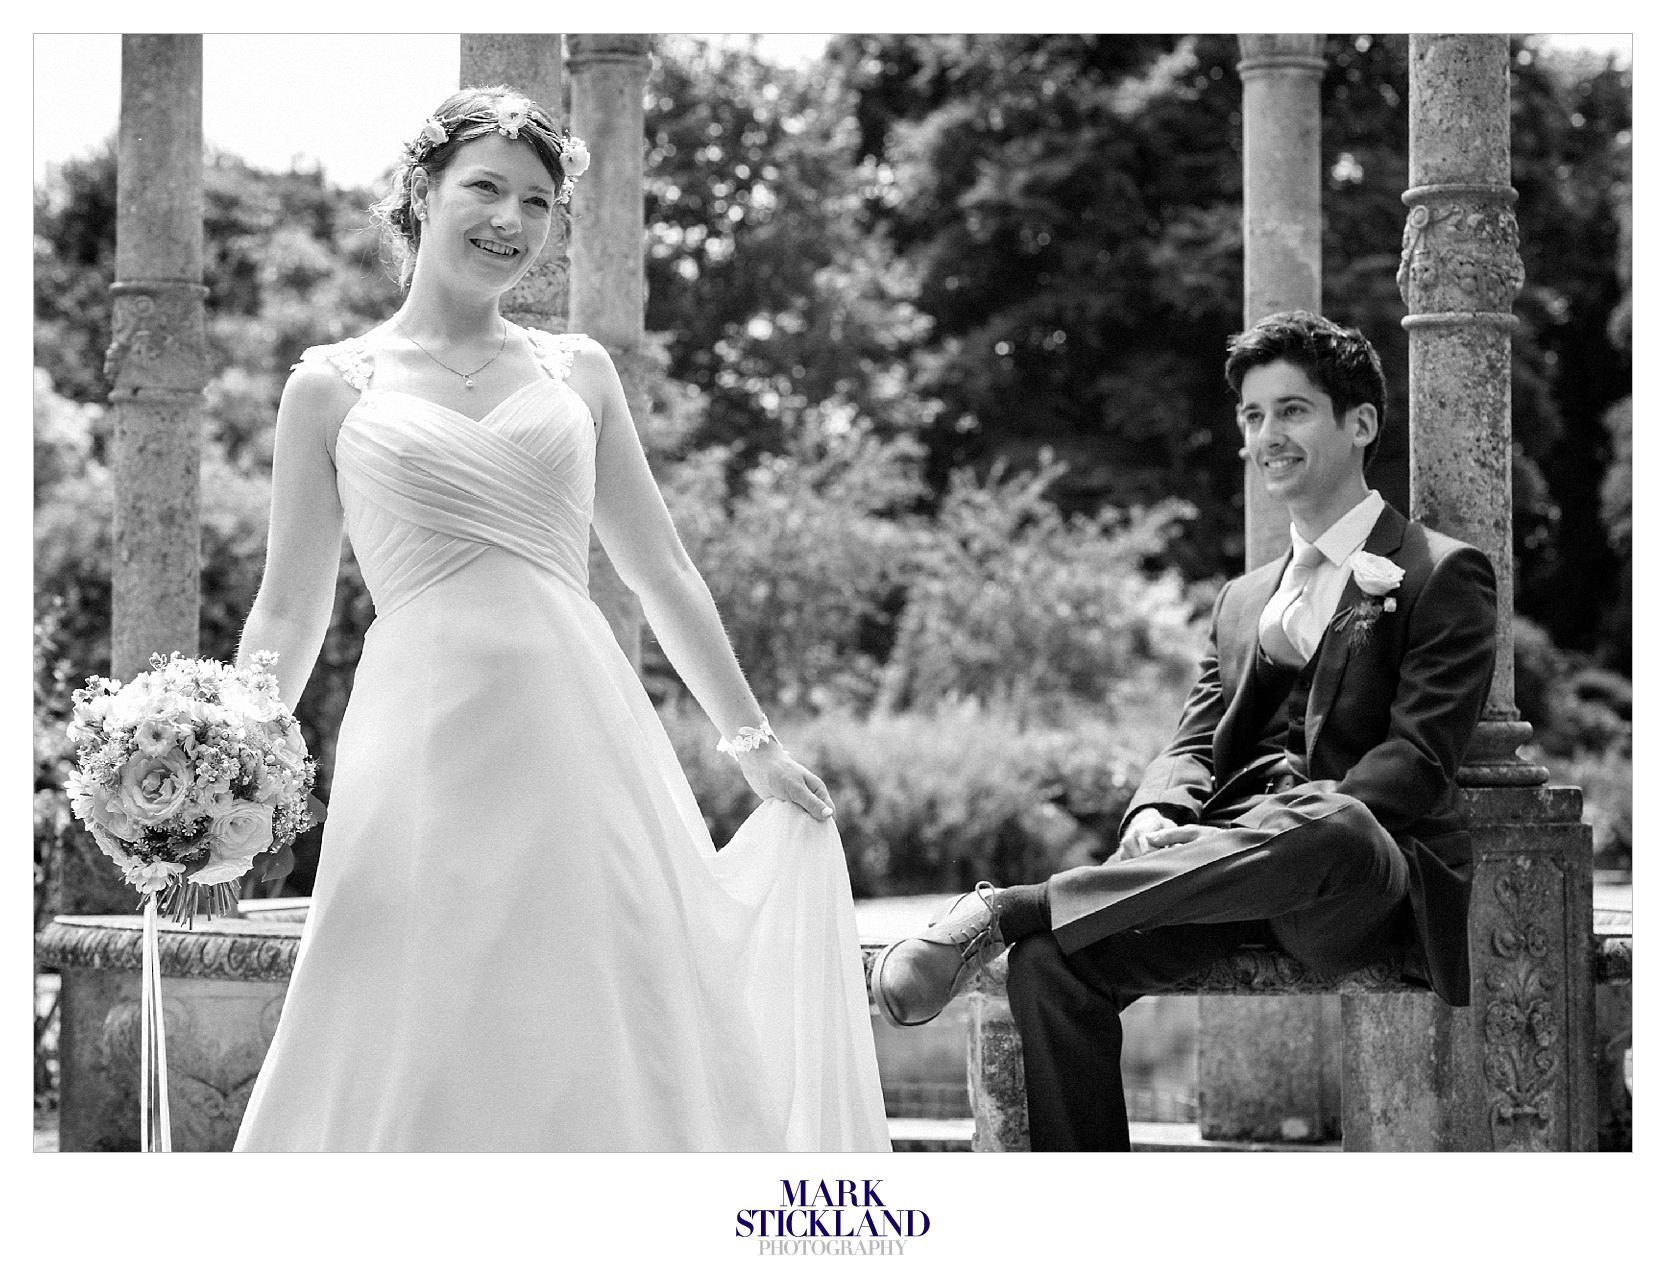 Springhead_wedding_fontmell magna_dorset_0013a